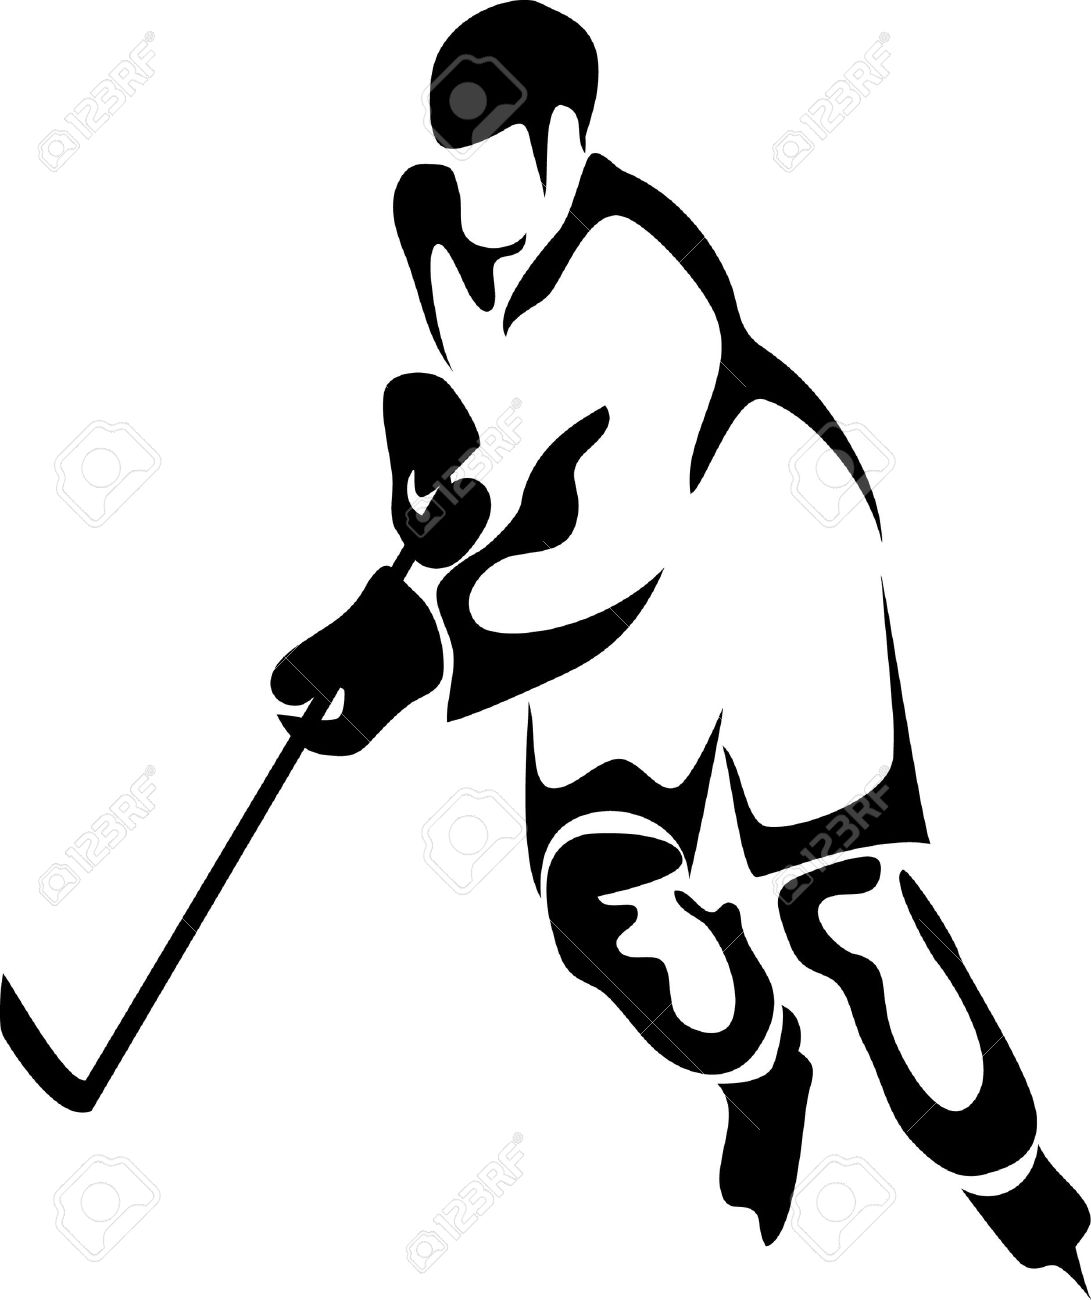 Hockey Player Shooting Clipart . Skating-Hockey Player Shooting Clipart . skating ice: hockey player .-6